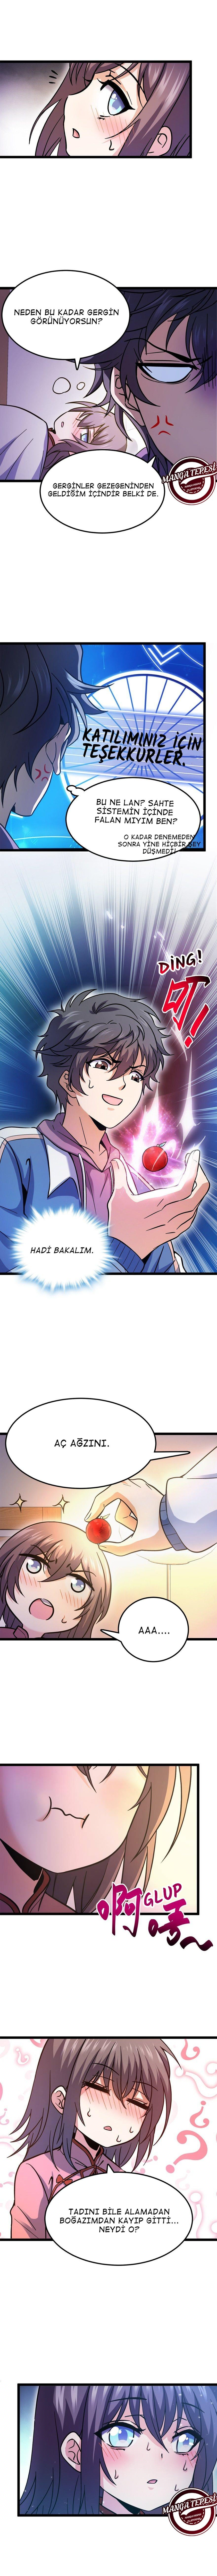 spare-me-great-lordbolum-9